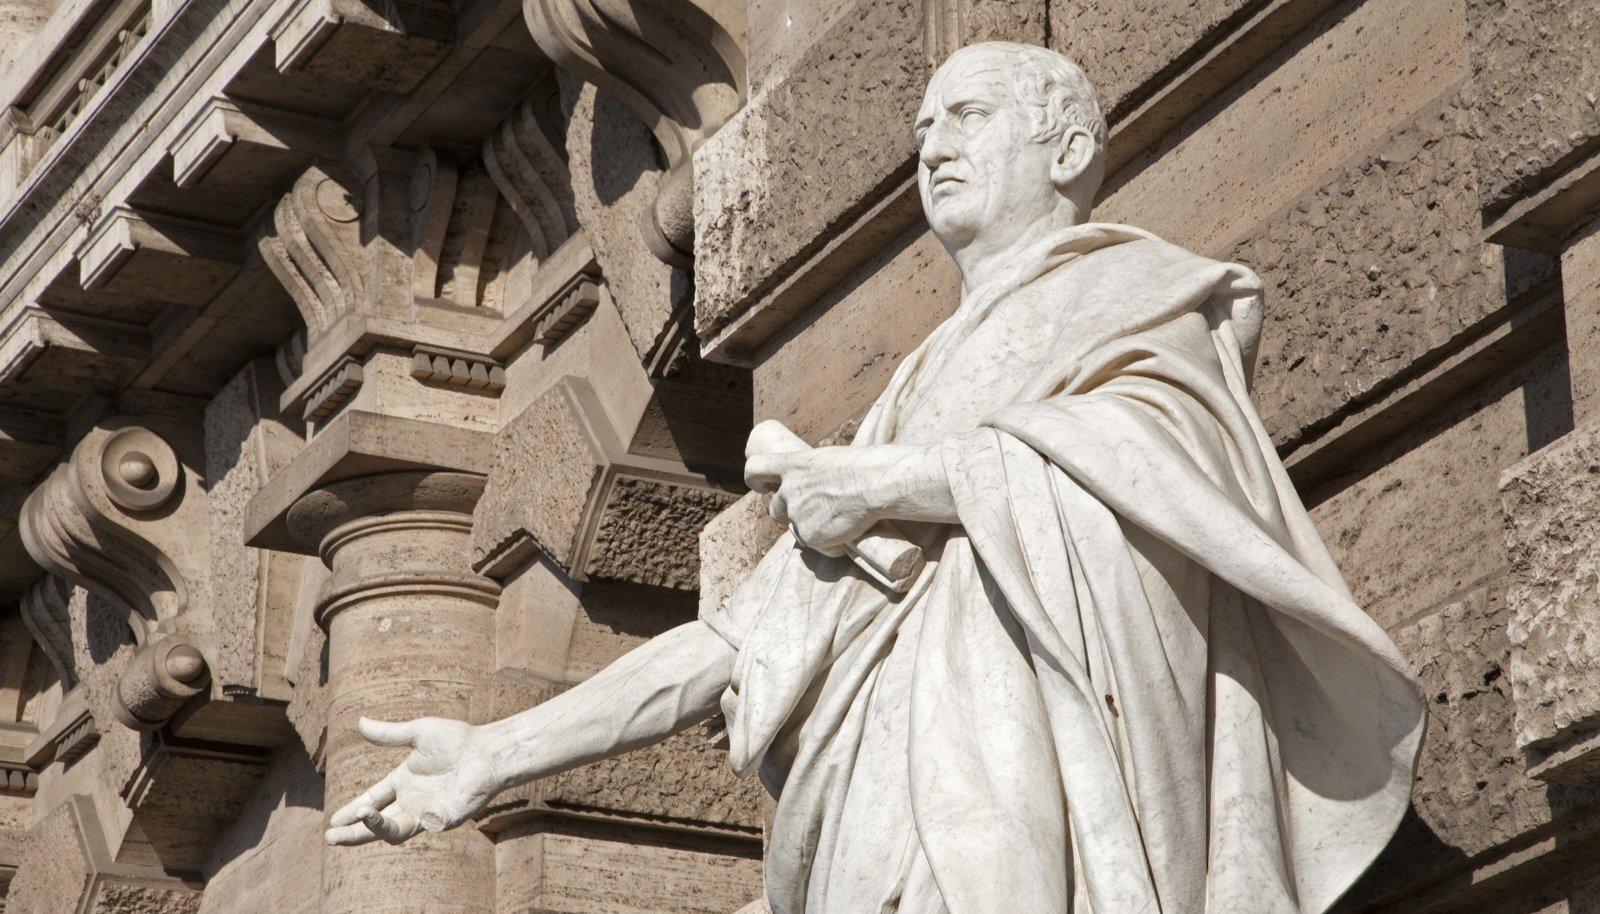 Kivisse raiutud Cicero RoomasPalazzo di Giustizia ees